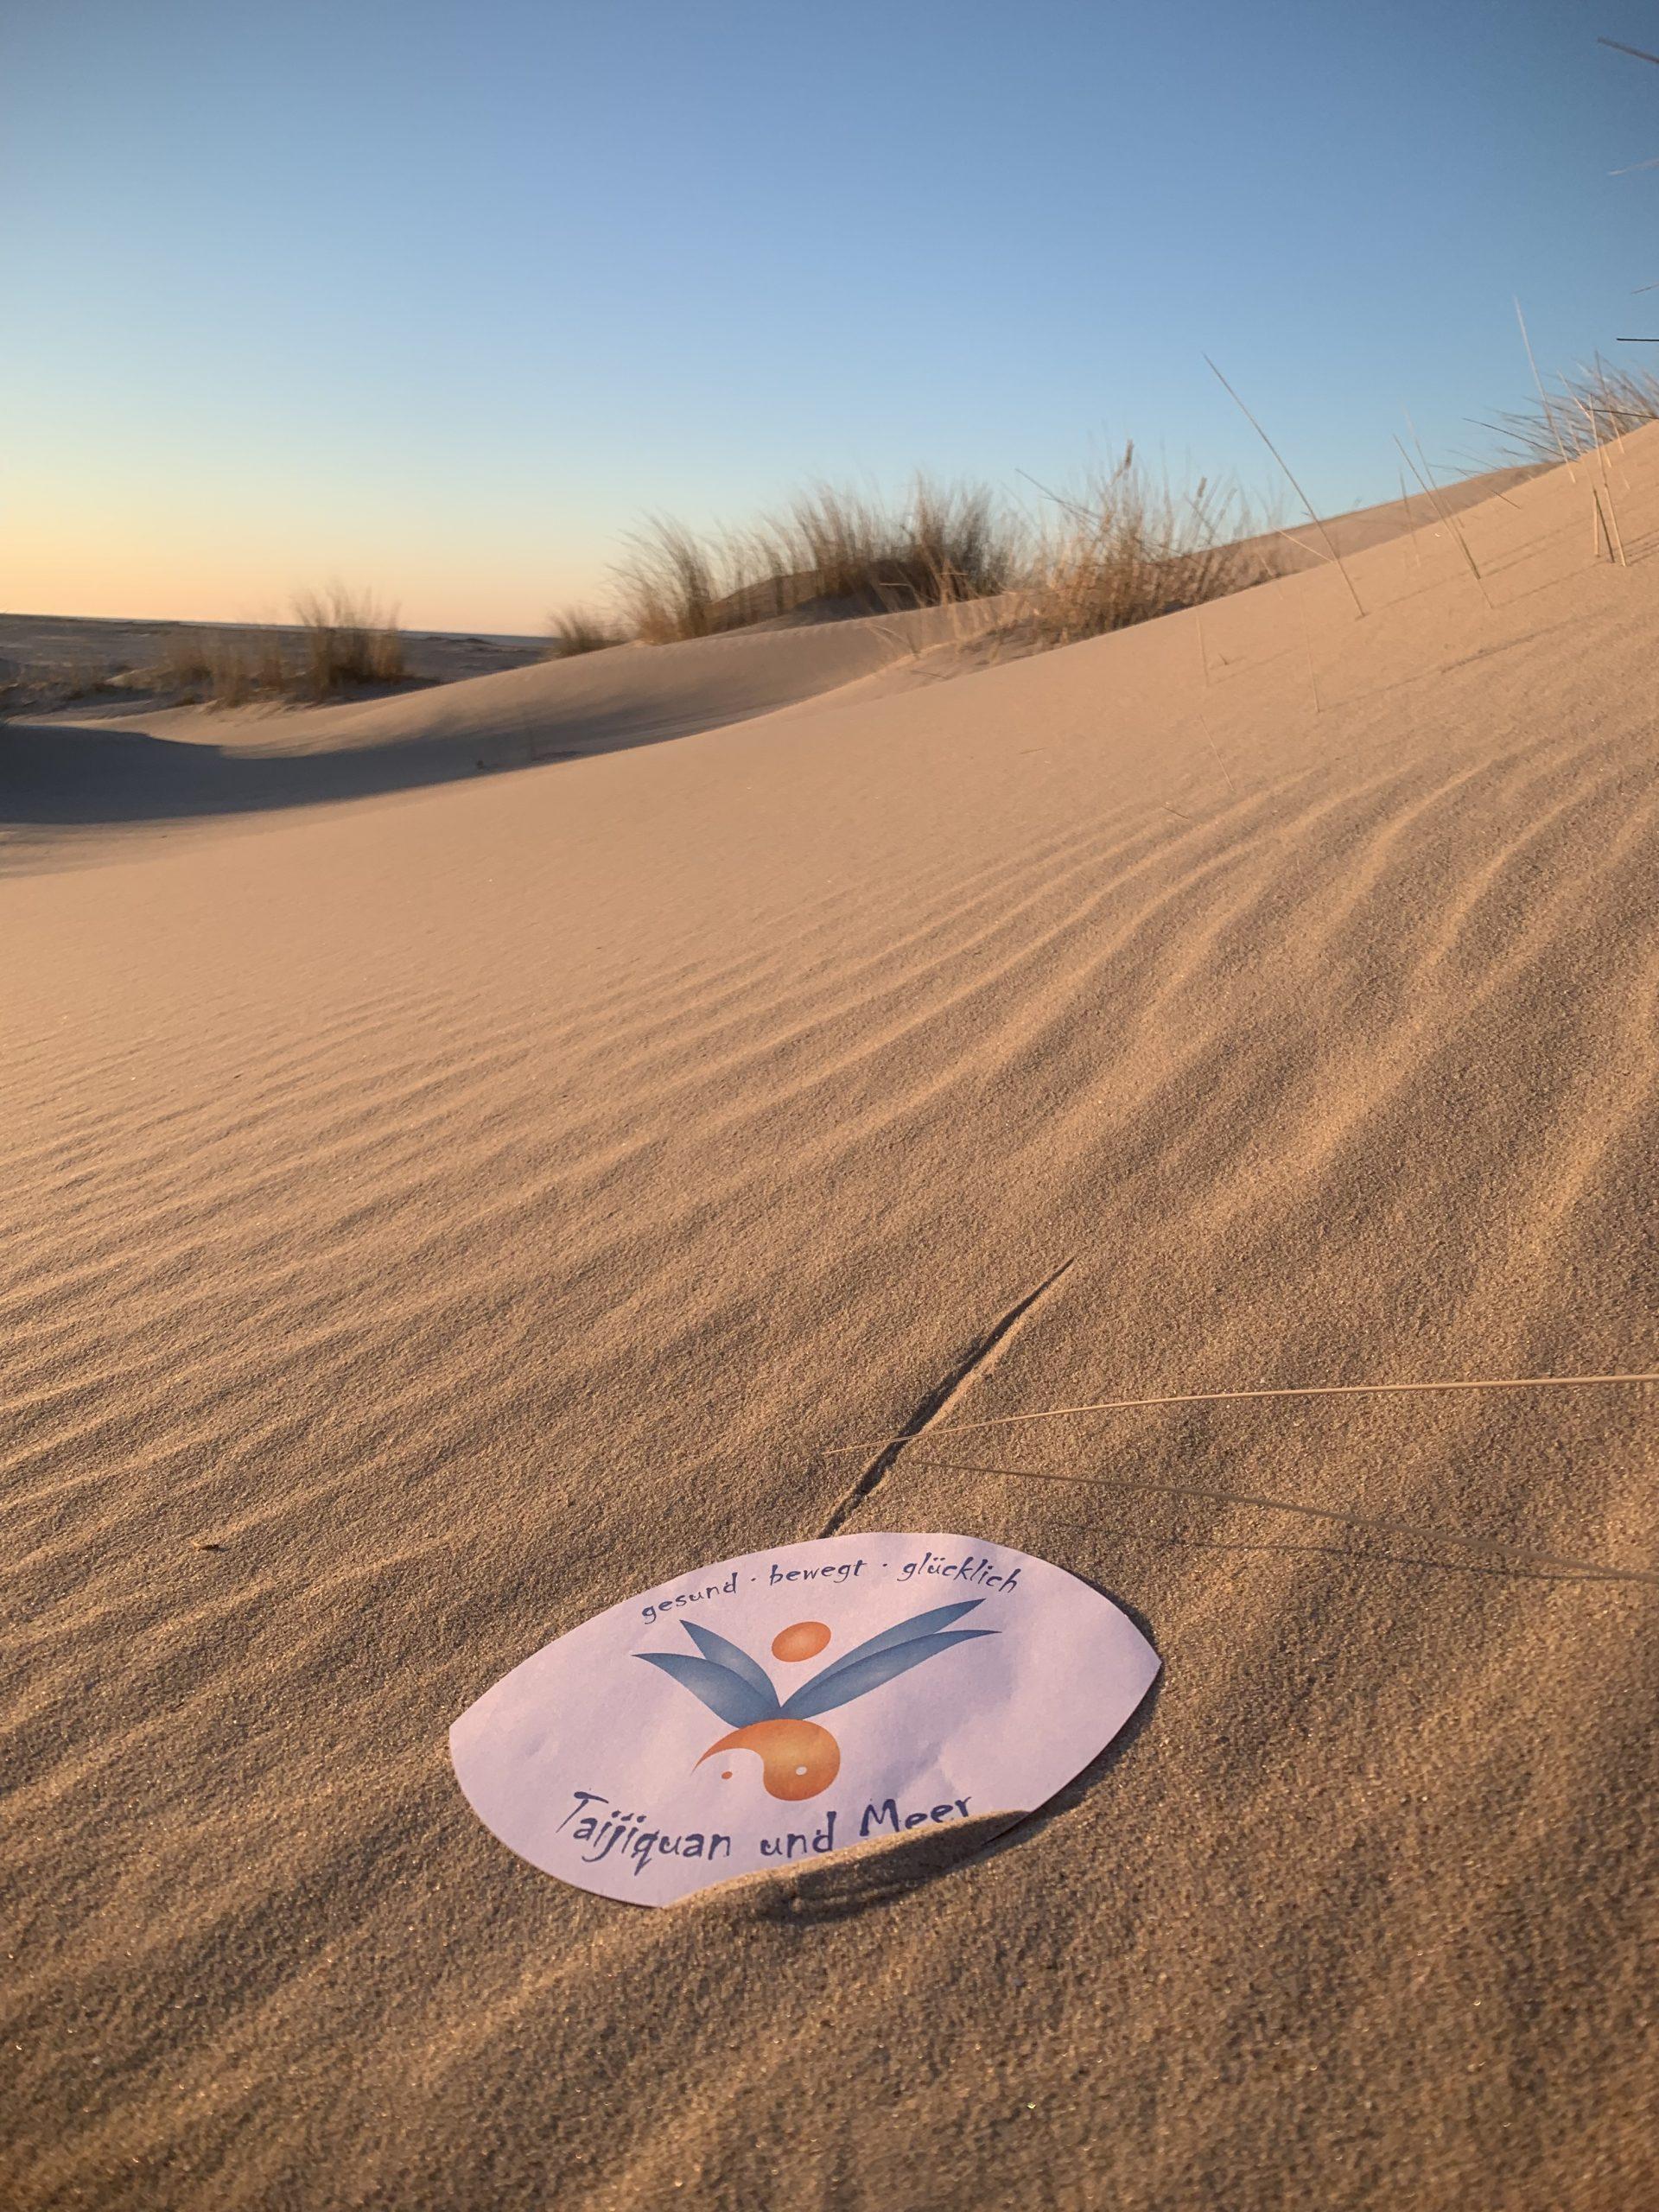 Taijiquan und Meer auf Norderney, tai chi chuan im Sand